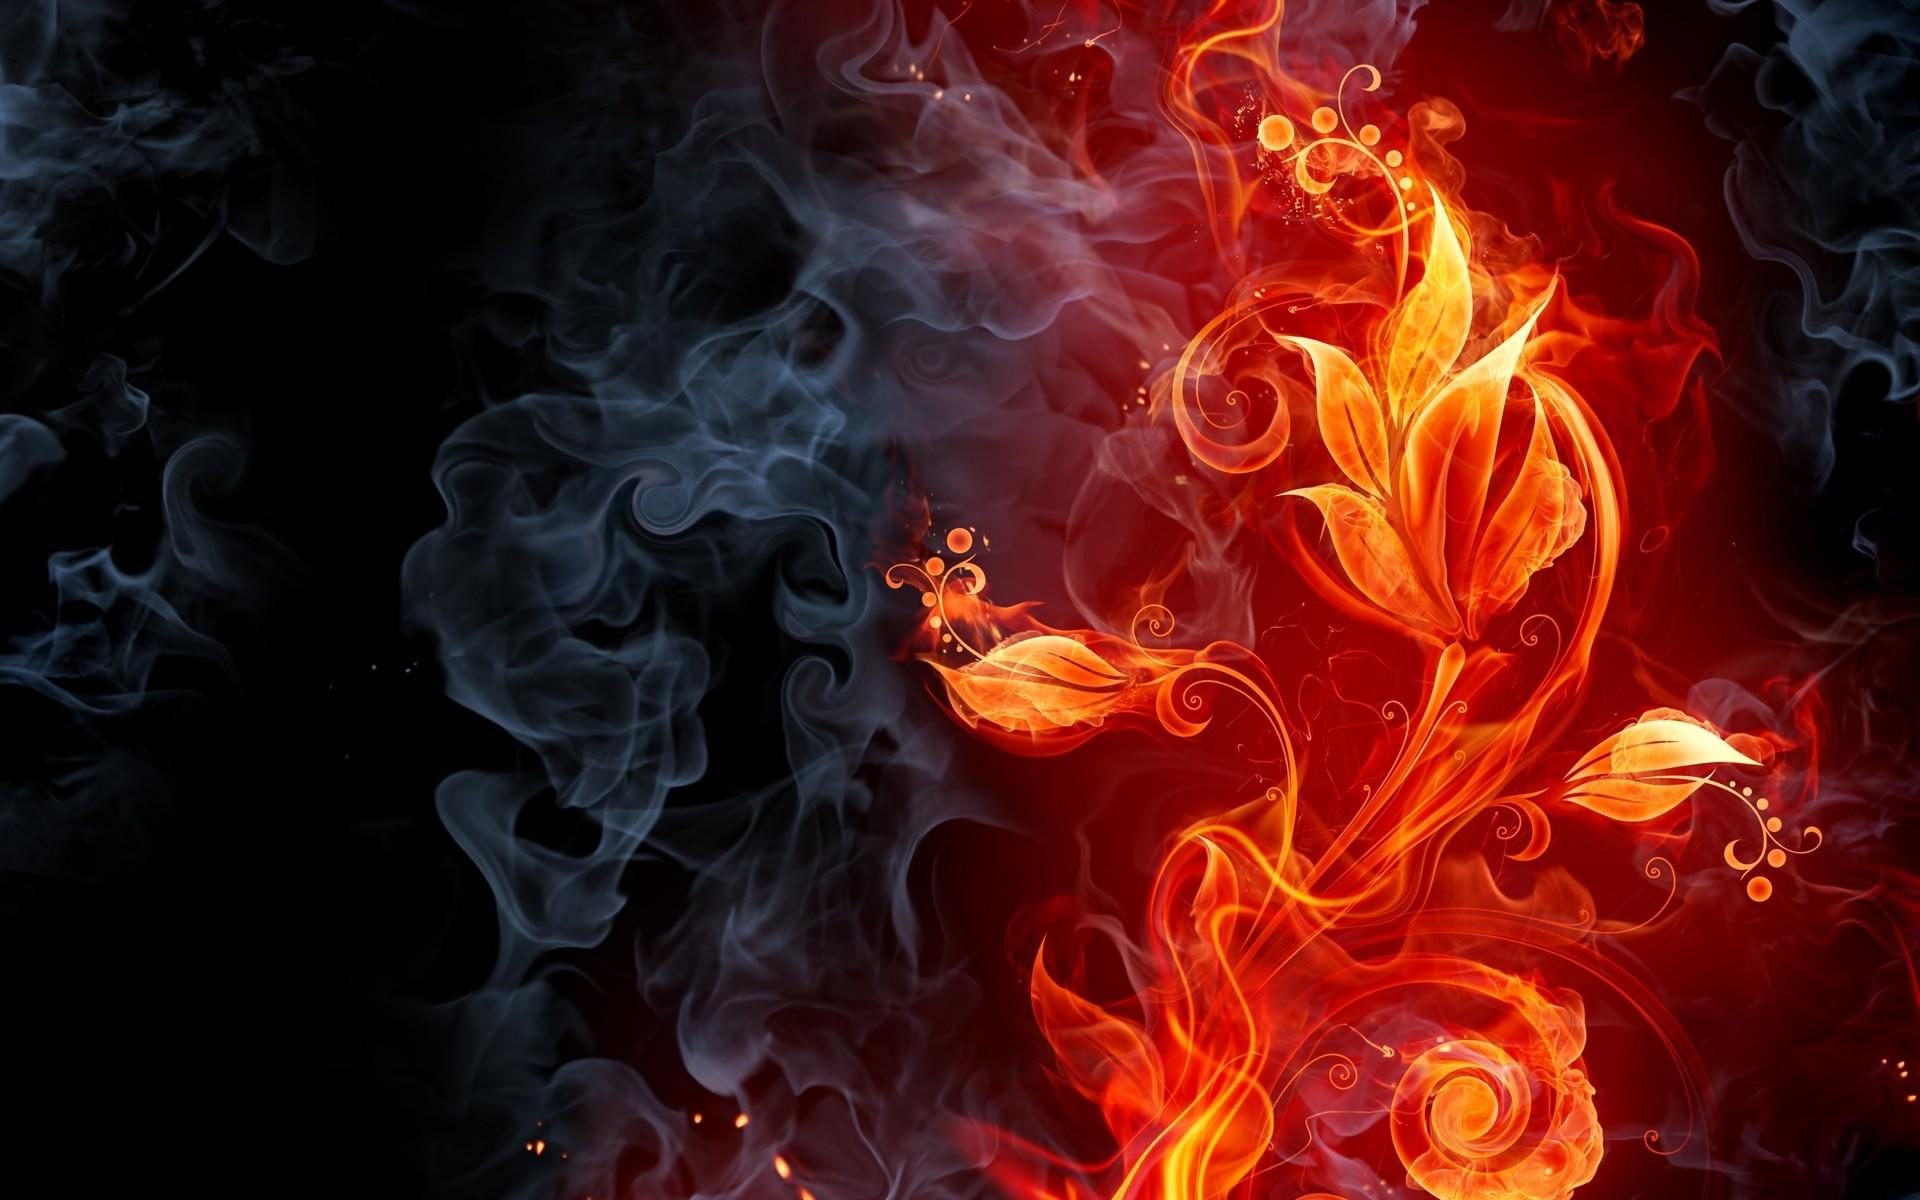 Abstract fire flames smoke flowers cg digital art color .